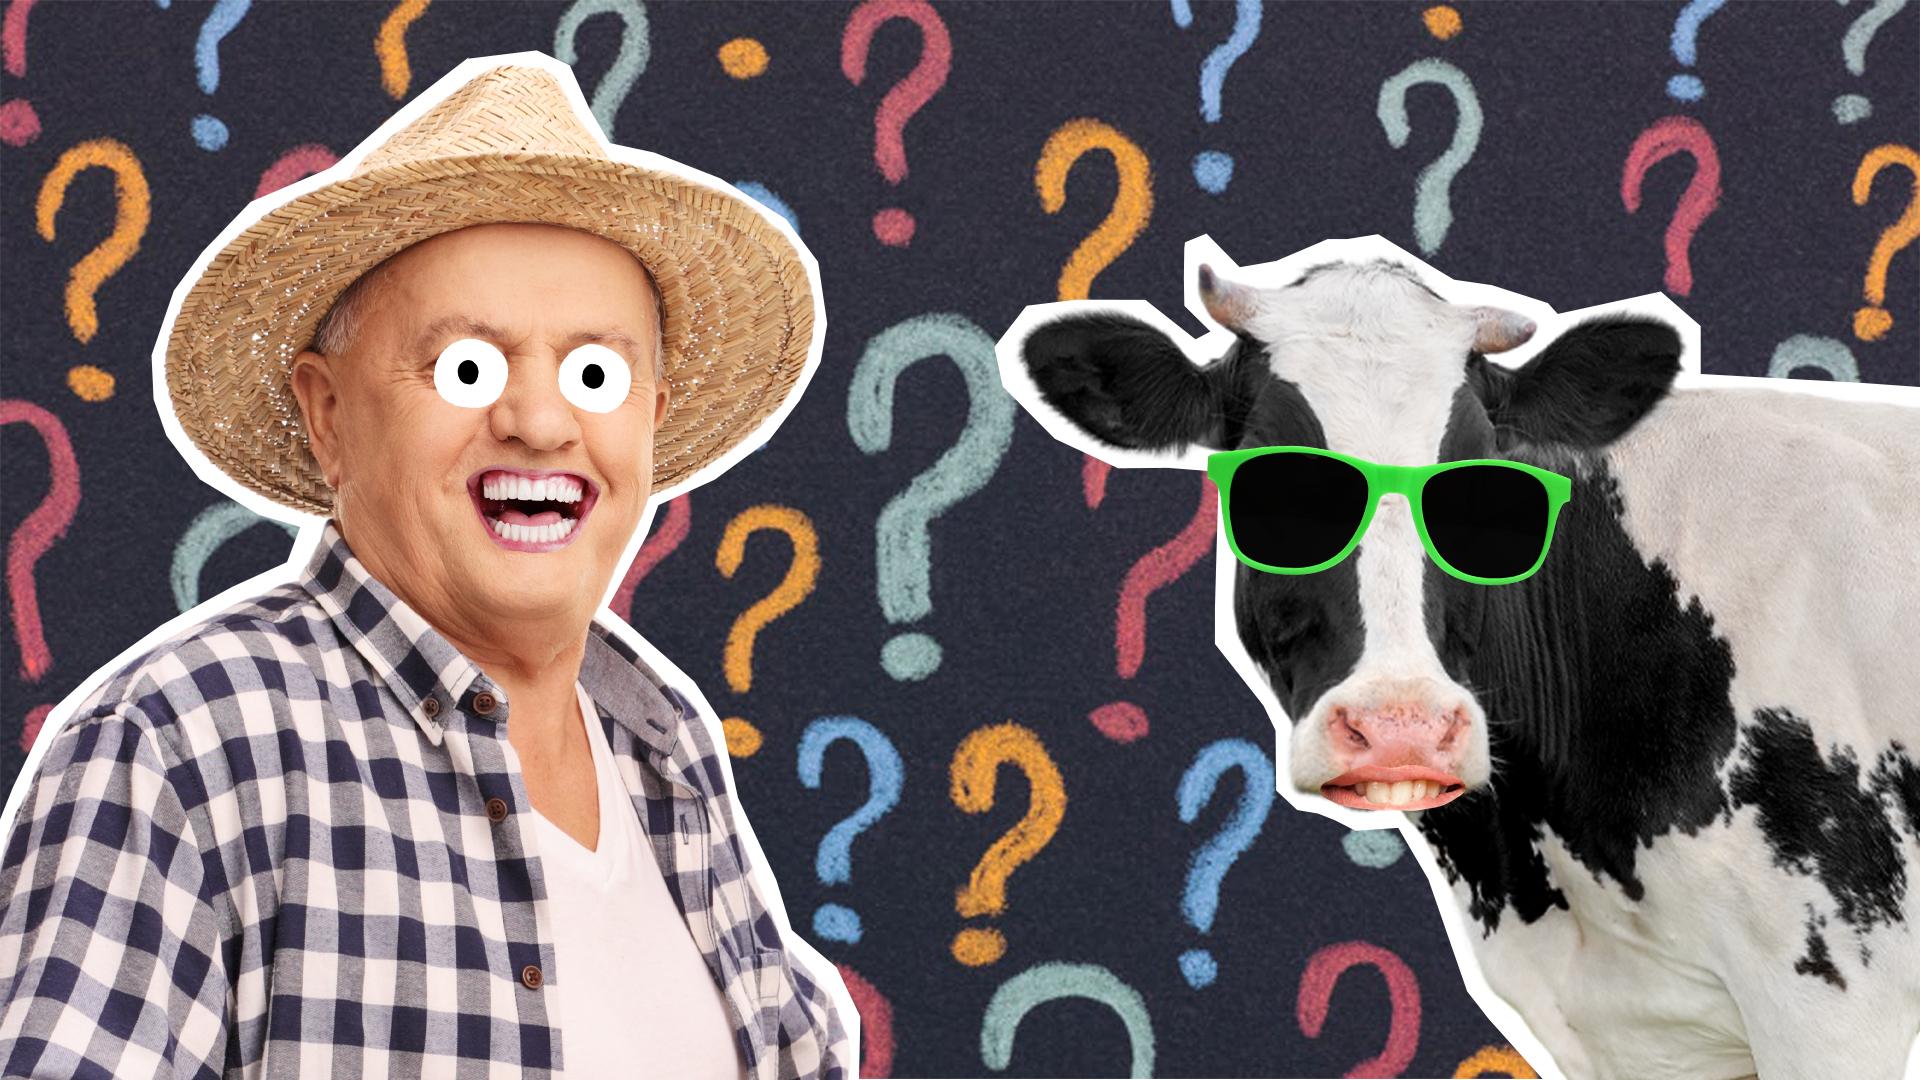 A farmer and a cow